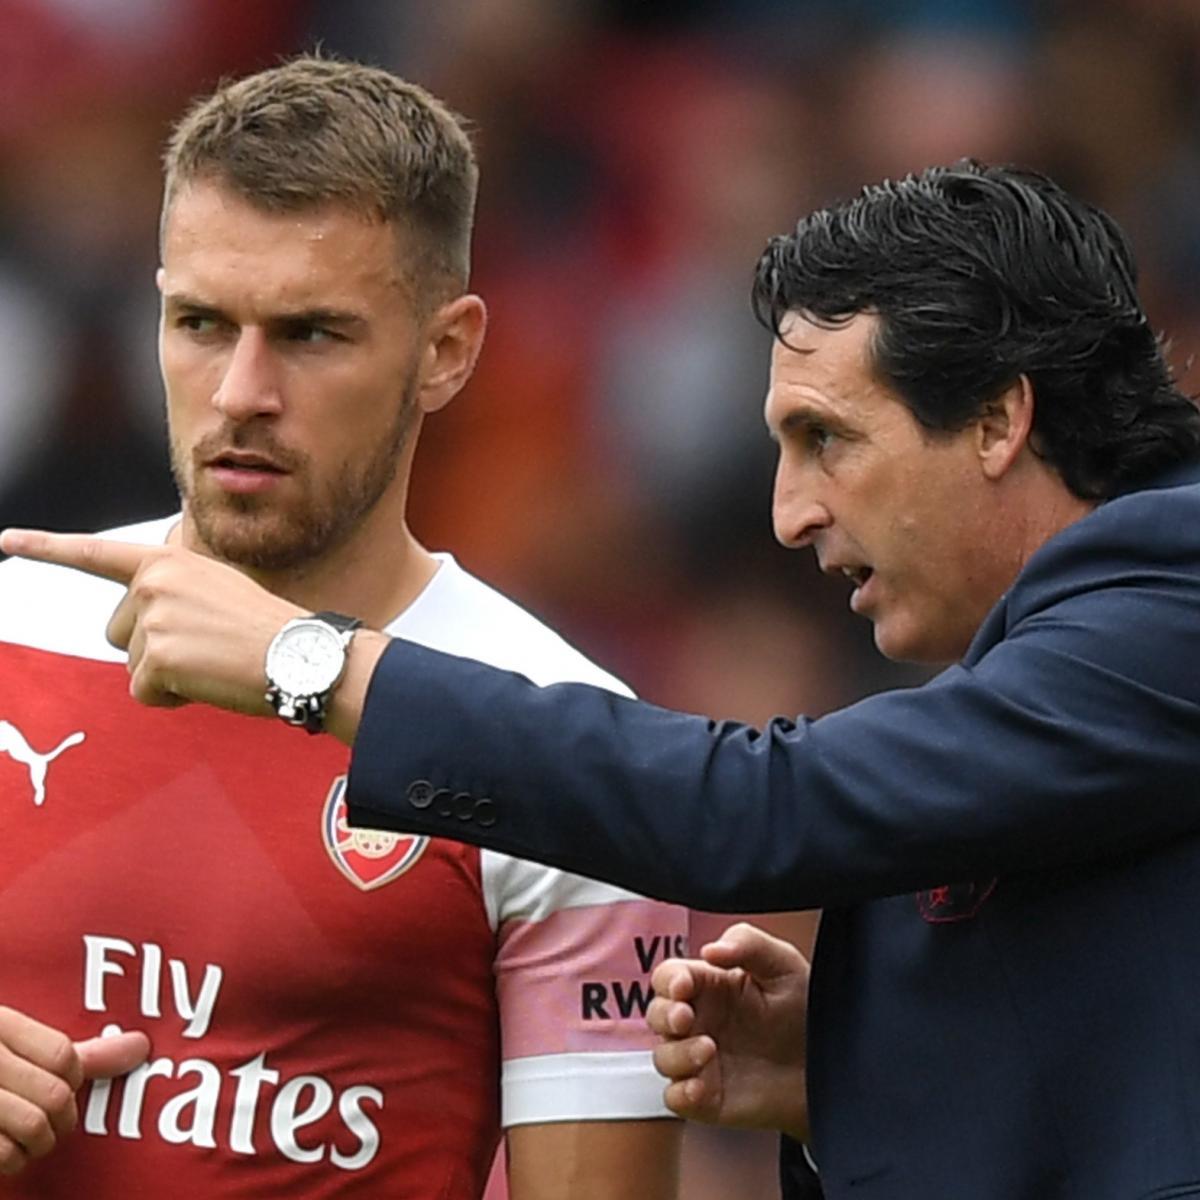 Unai Emery Praises Aaron Ramsey as Arsenal Target Replacements for Midfielder